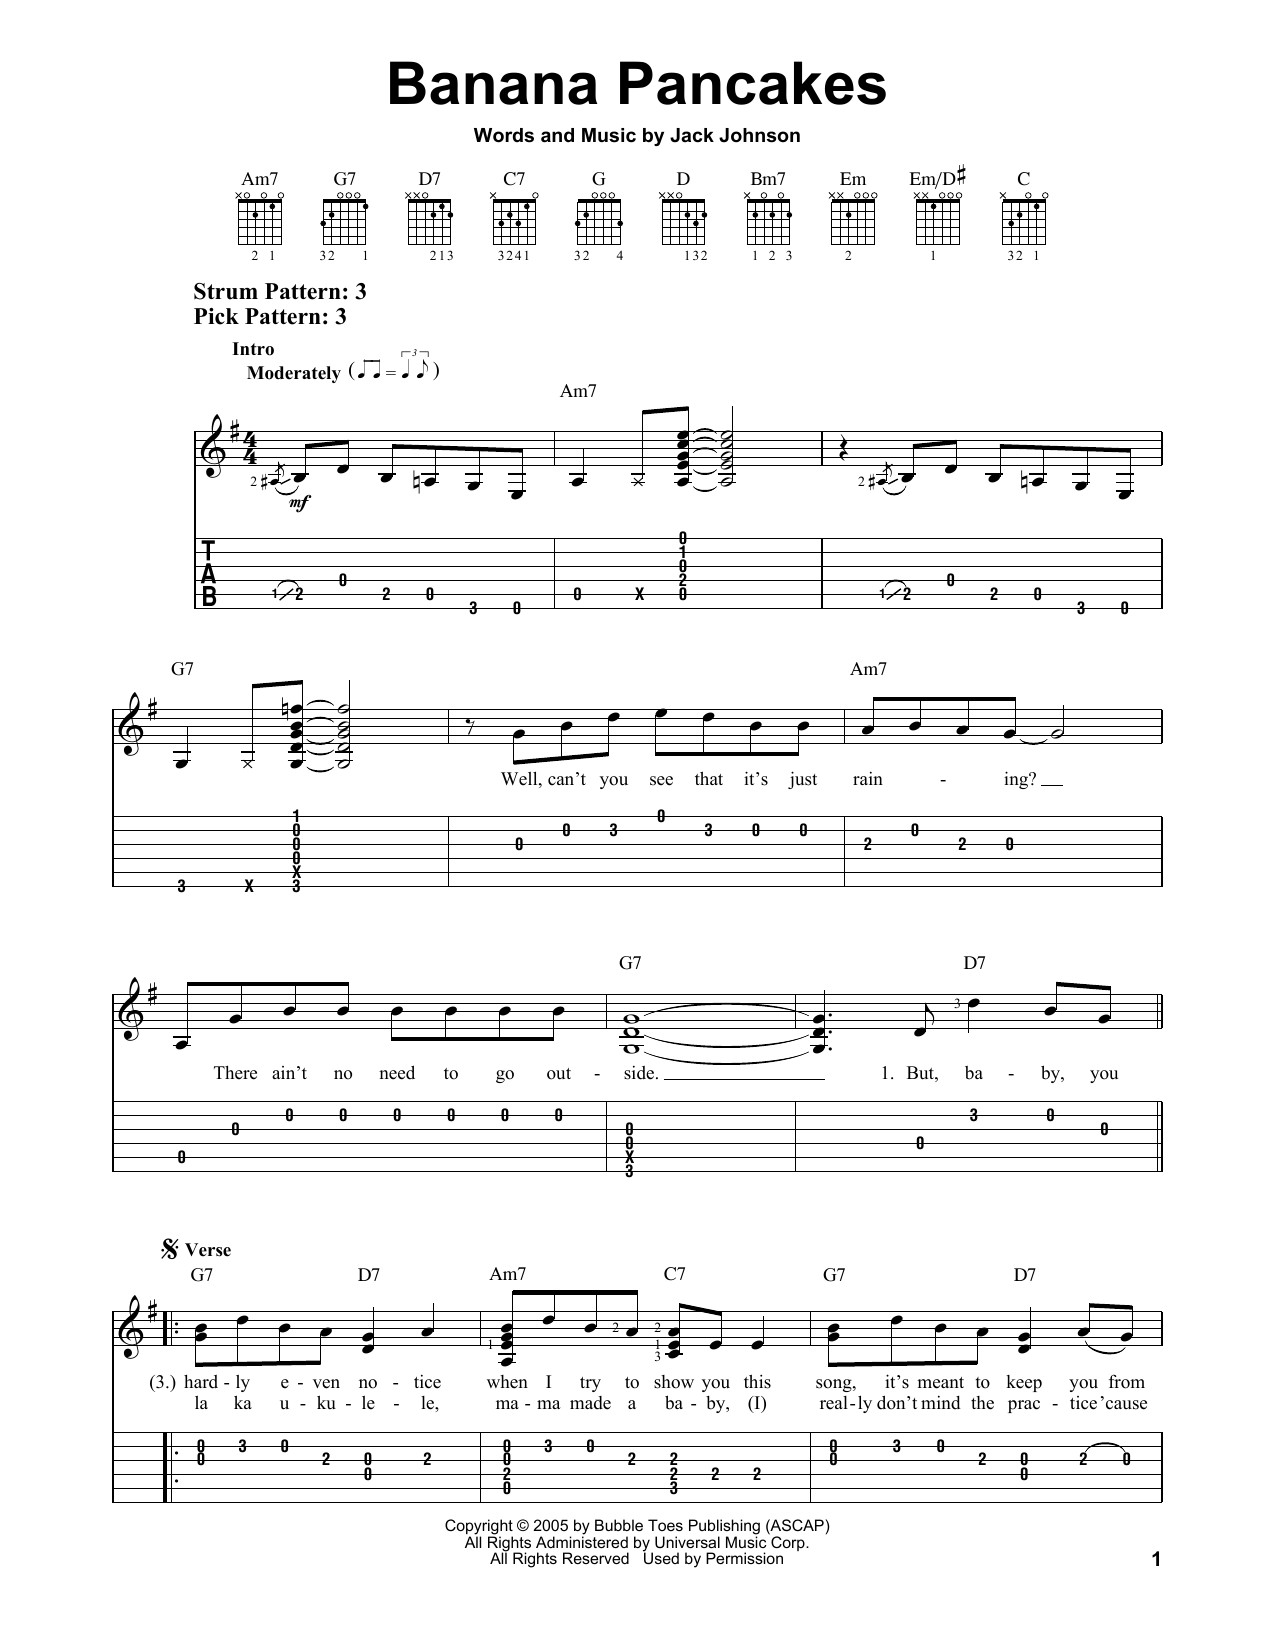 Banana Pancakes Lyrics  Banana Pancakes sheet music by Jack Johnson Easy Guitar